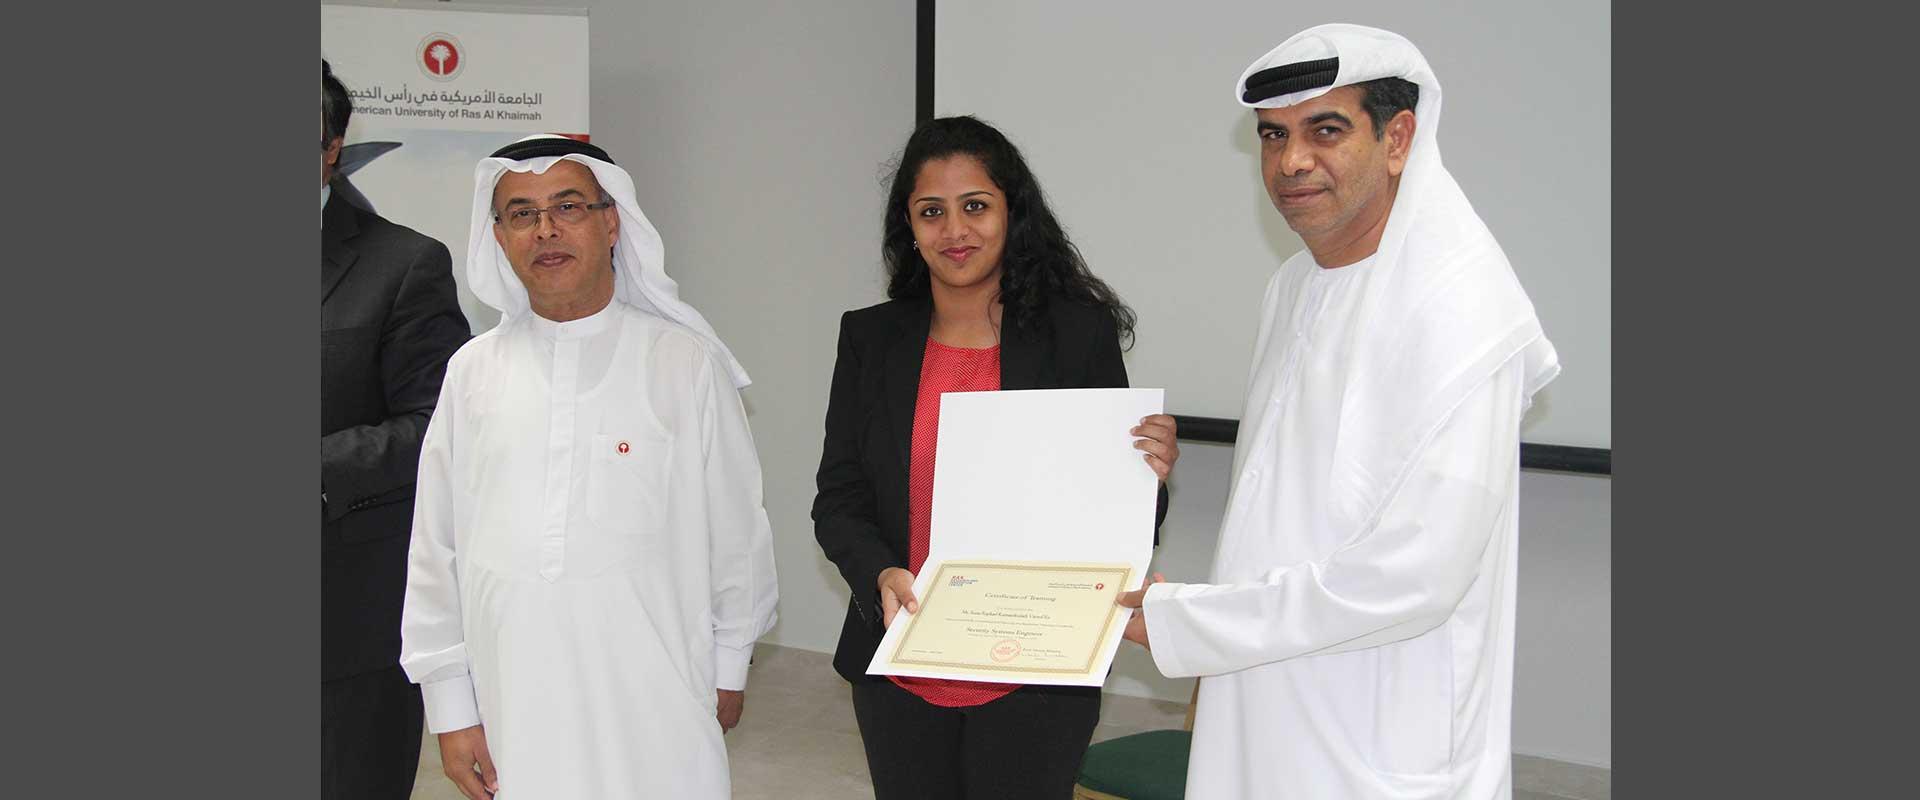 Certificate Delivery Ceremony American University Of Ras Al